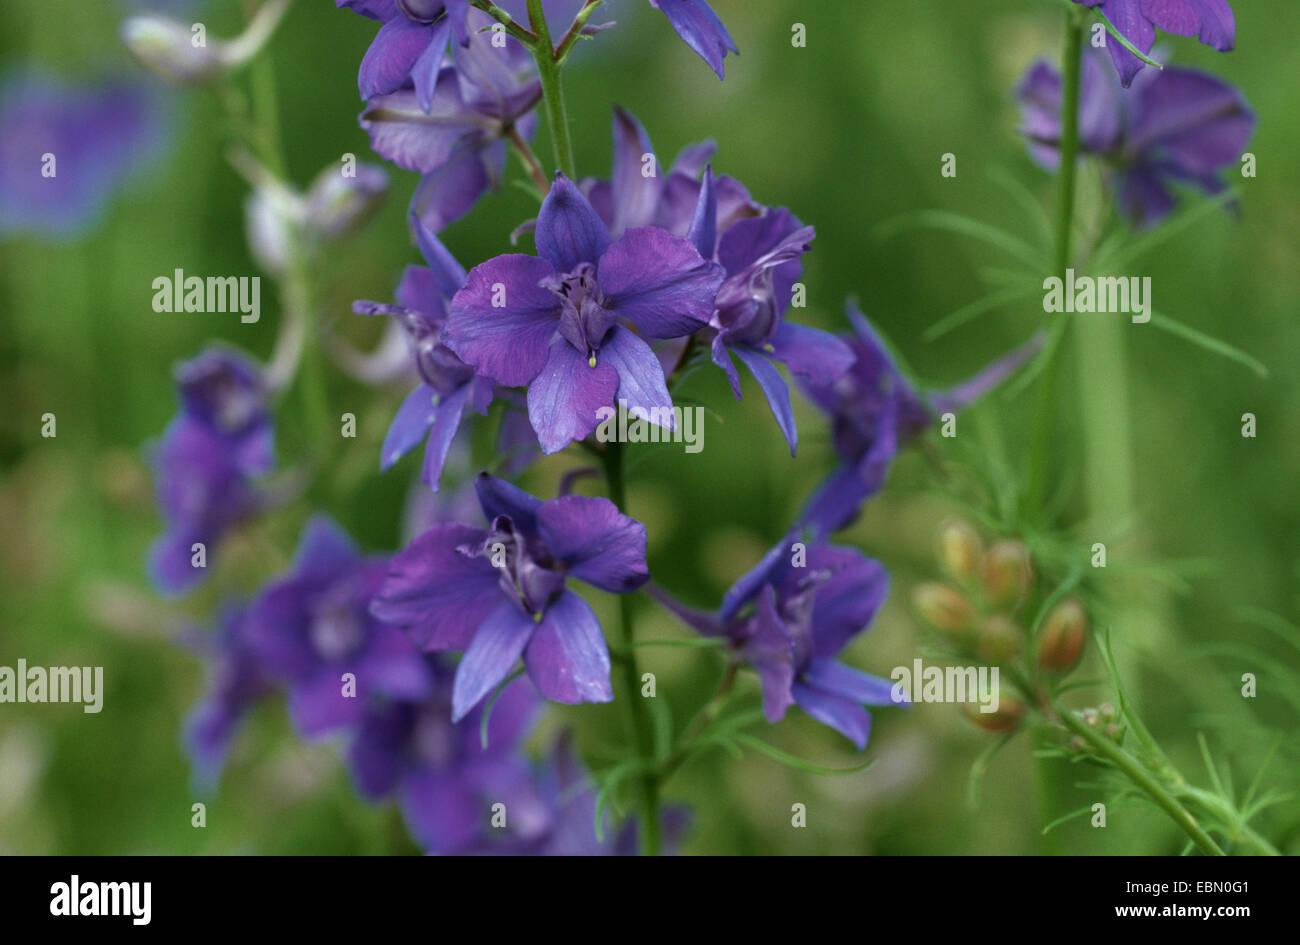 Doubtful knight's-spur, Larkspur, Annual Delphinium (Consolida ajacis, Delphinium ajacis), blooming - Stock Image